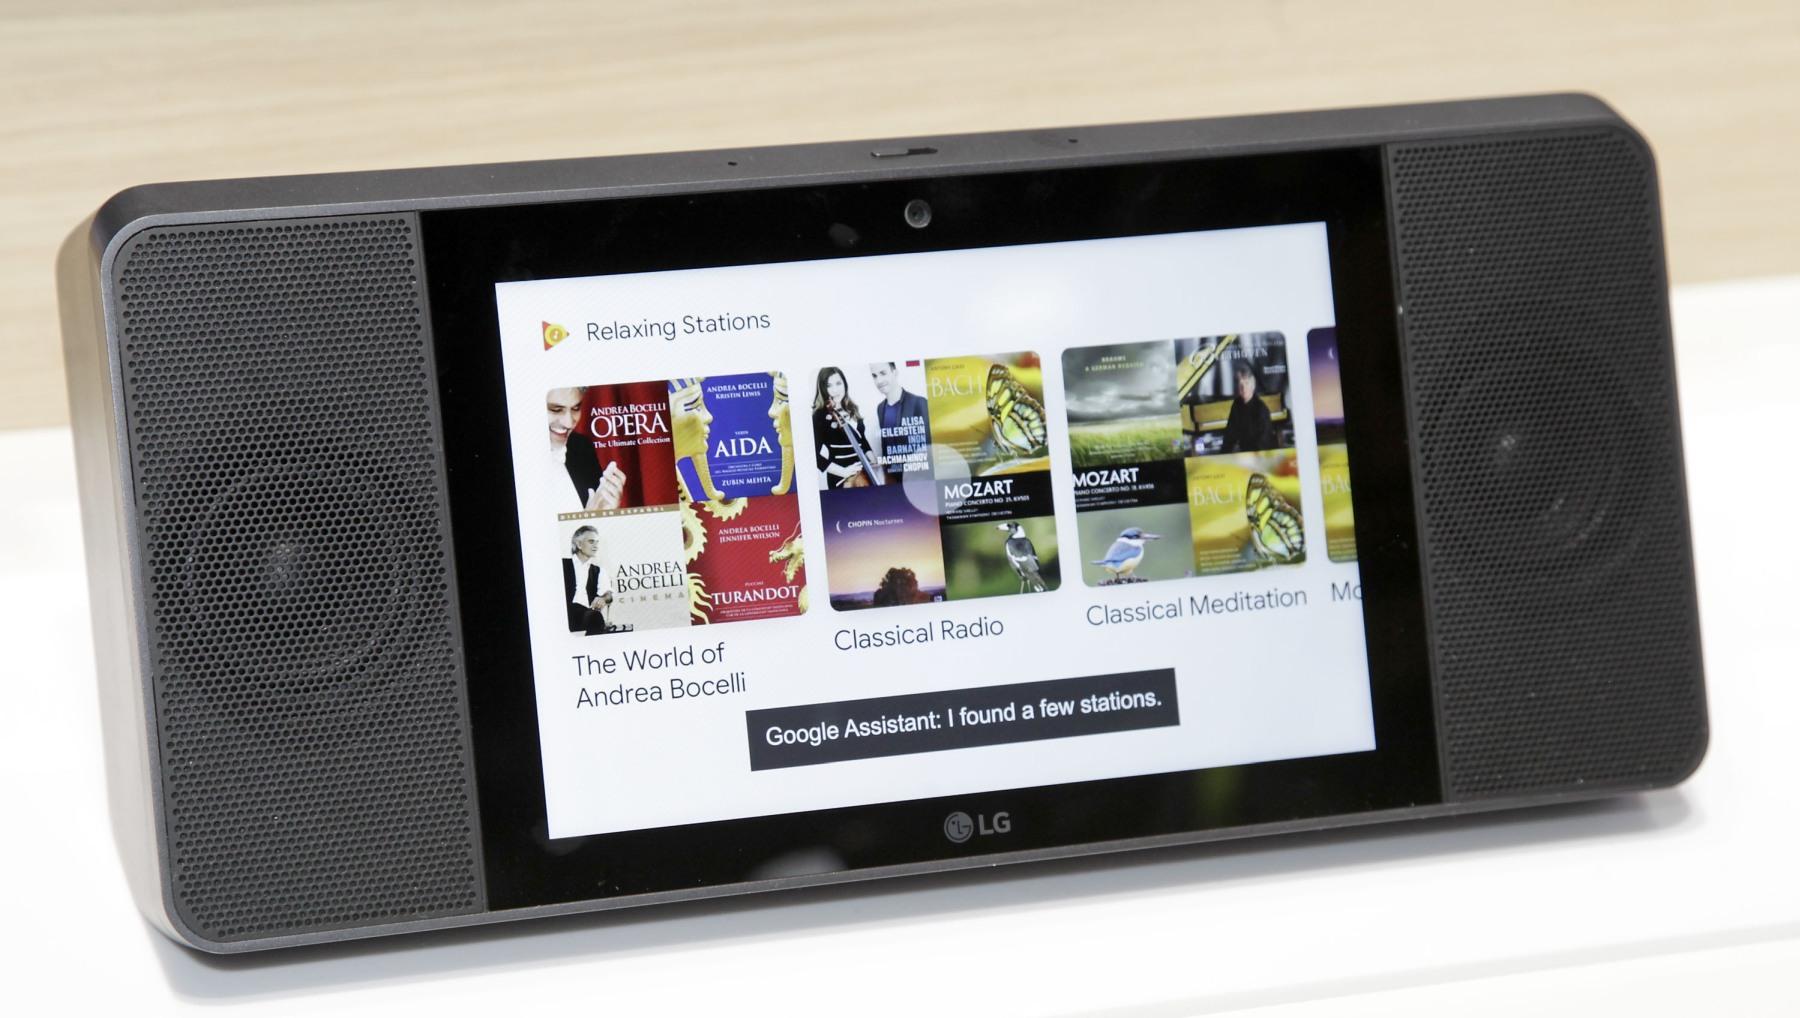 Google Play Music homescreen on the LG Smart Display